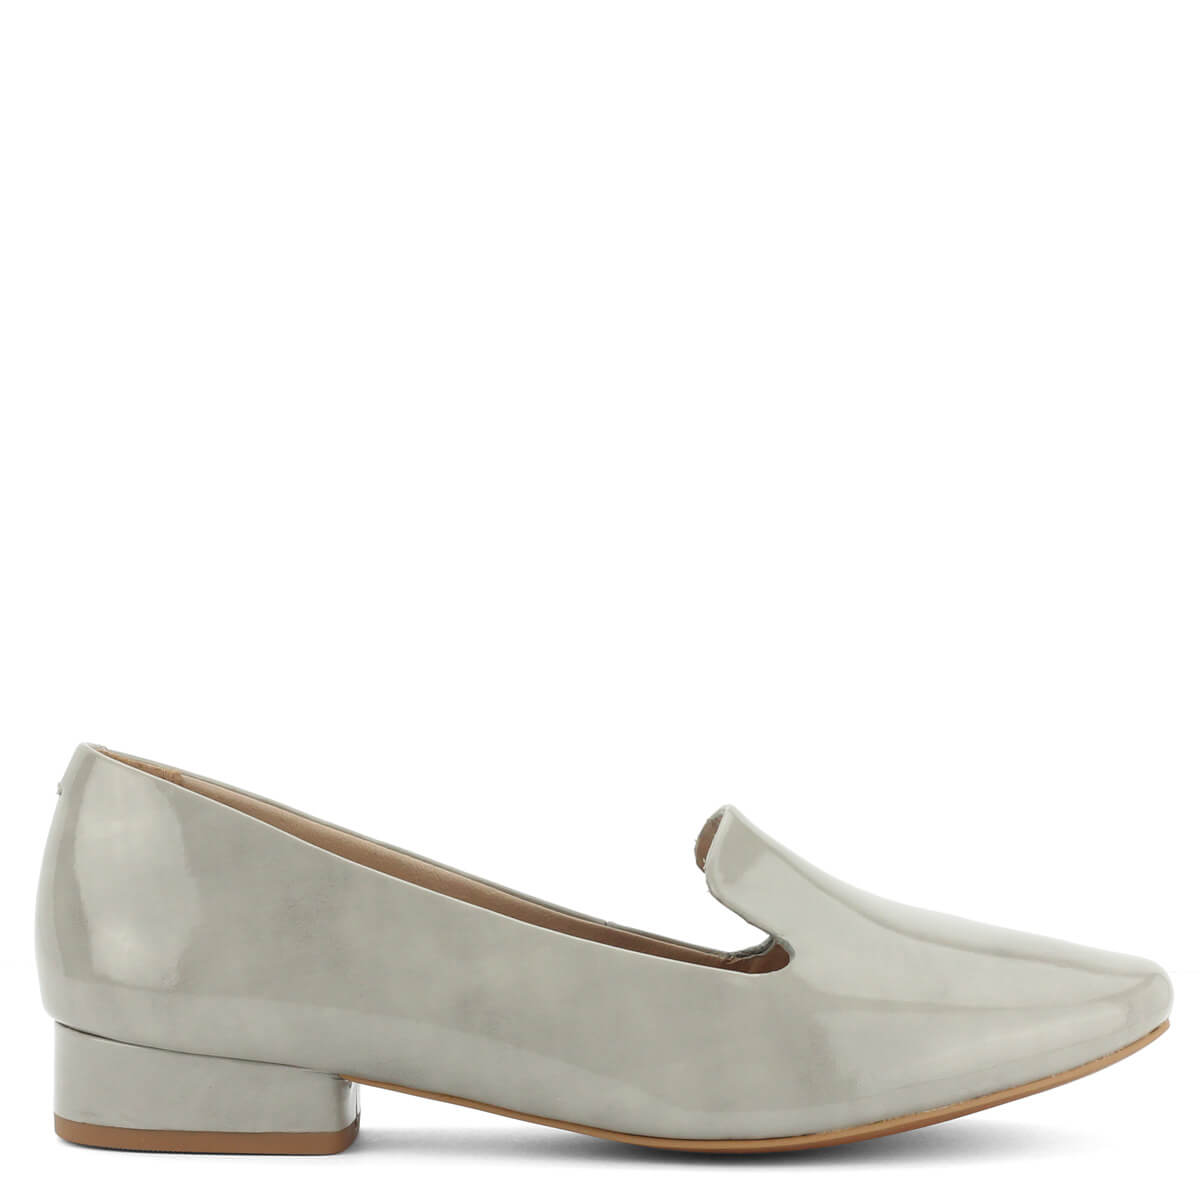 Be Natural elegáns női cipő. Prémium minőségű kis sarkú szürke női ... 06020f48ef